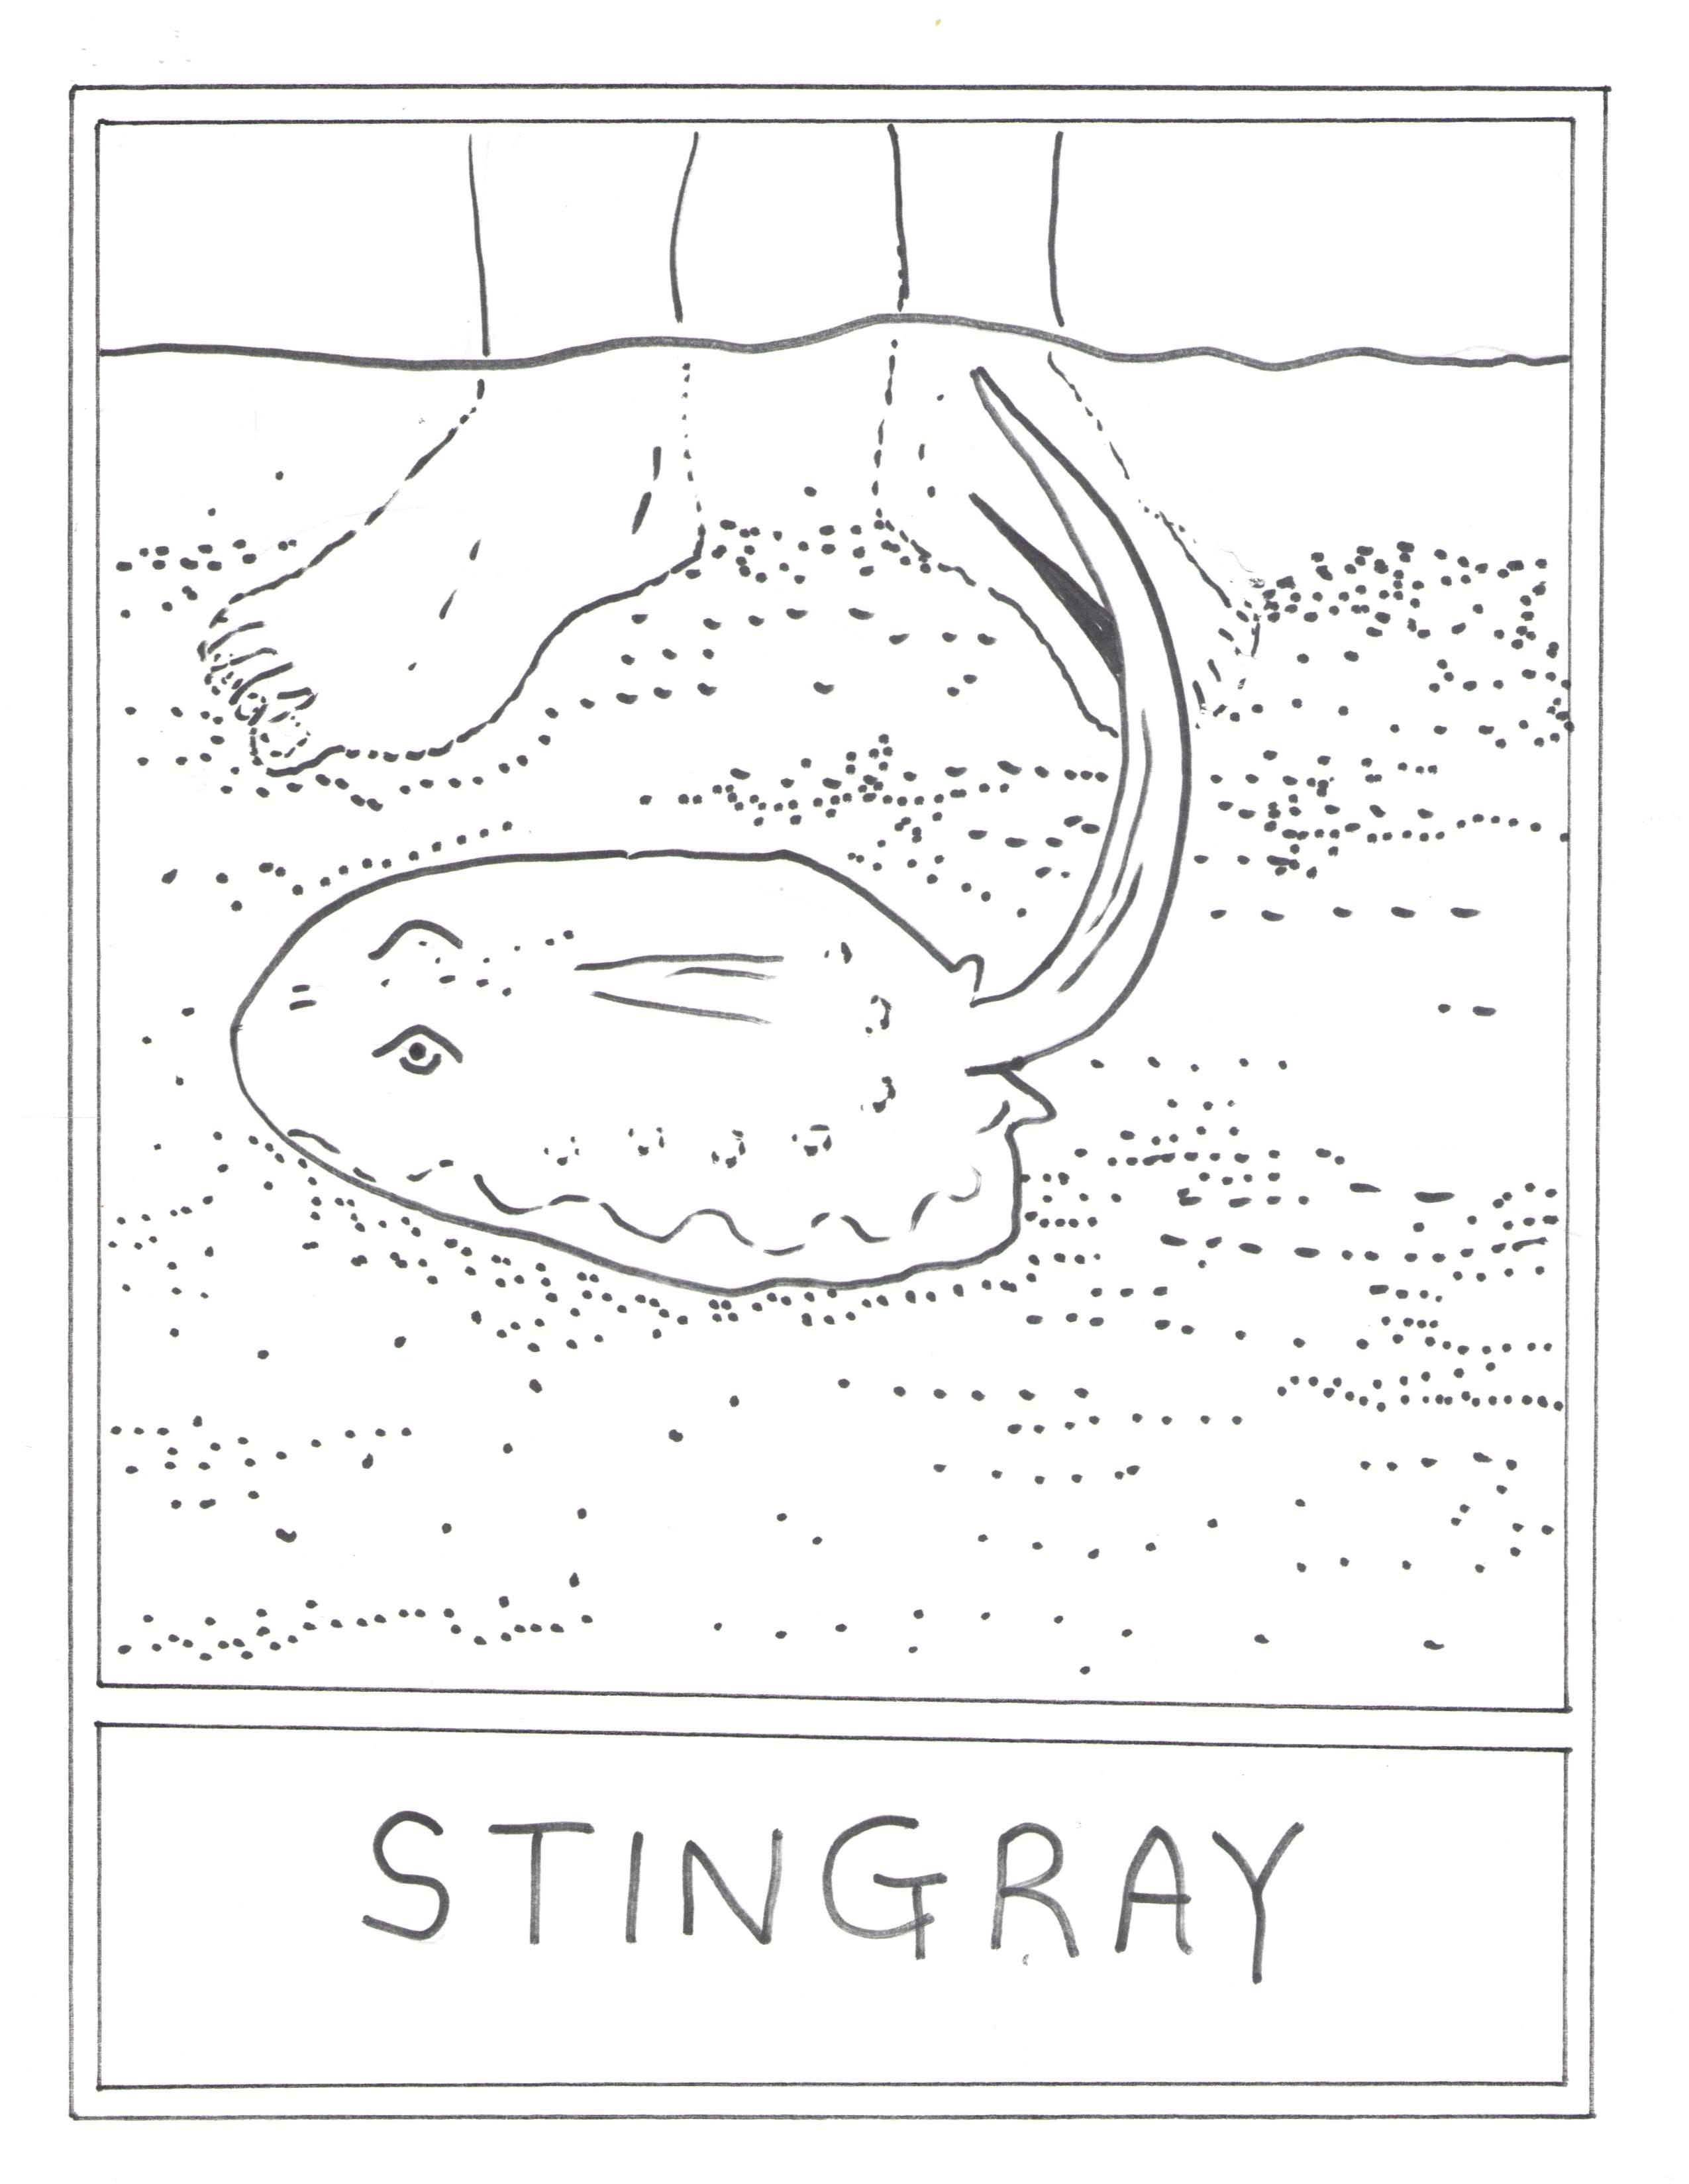 Dorable Stingray Anatomy Diagram Ideas - Anatomy and Physiology ...